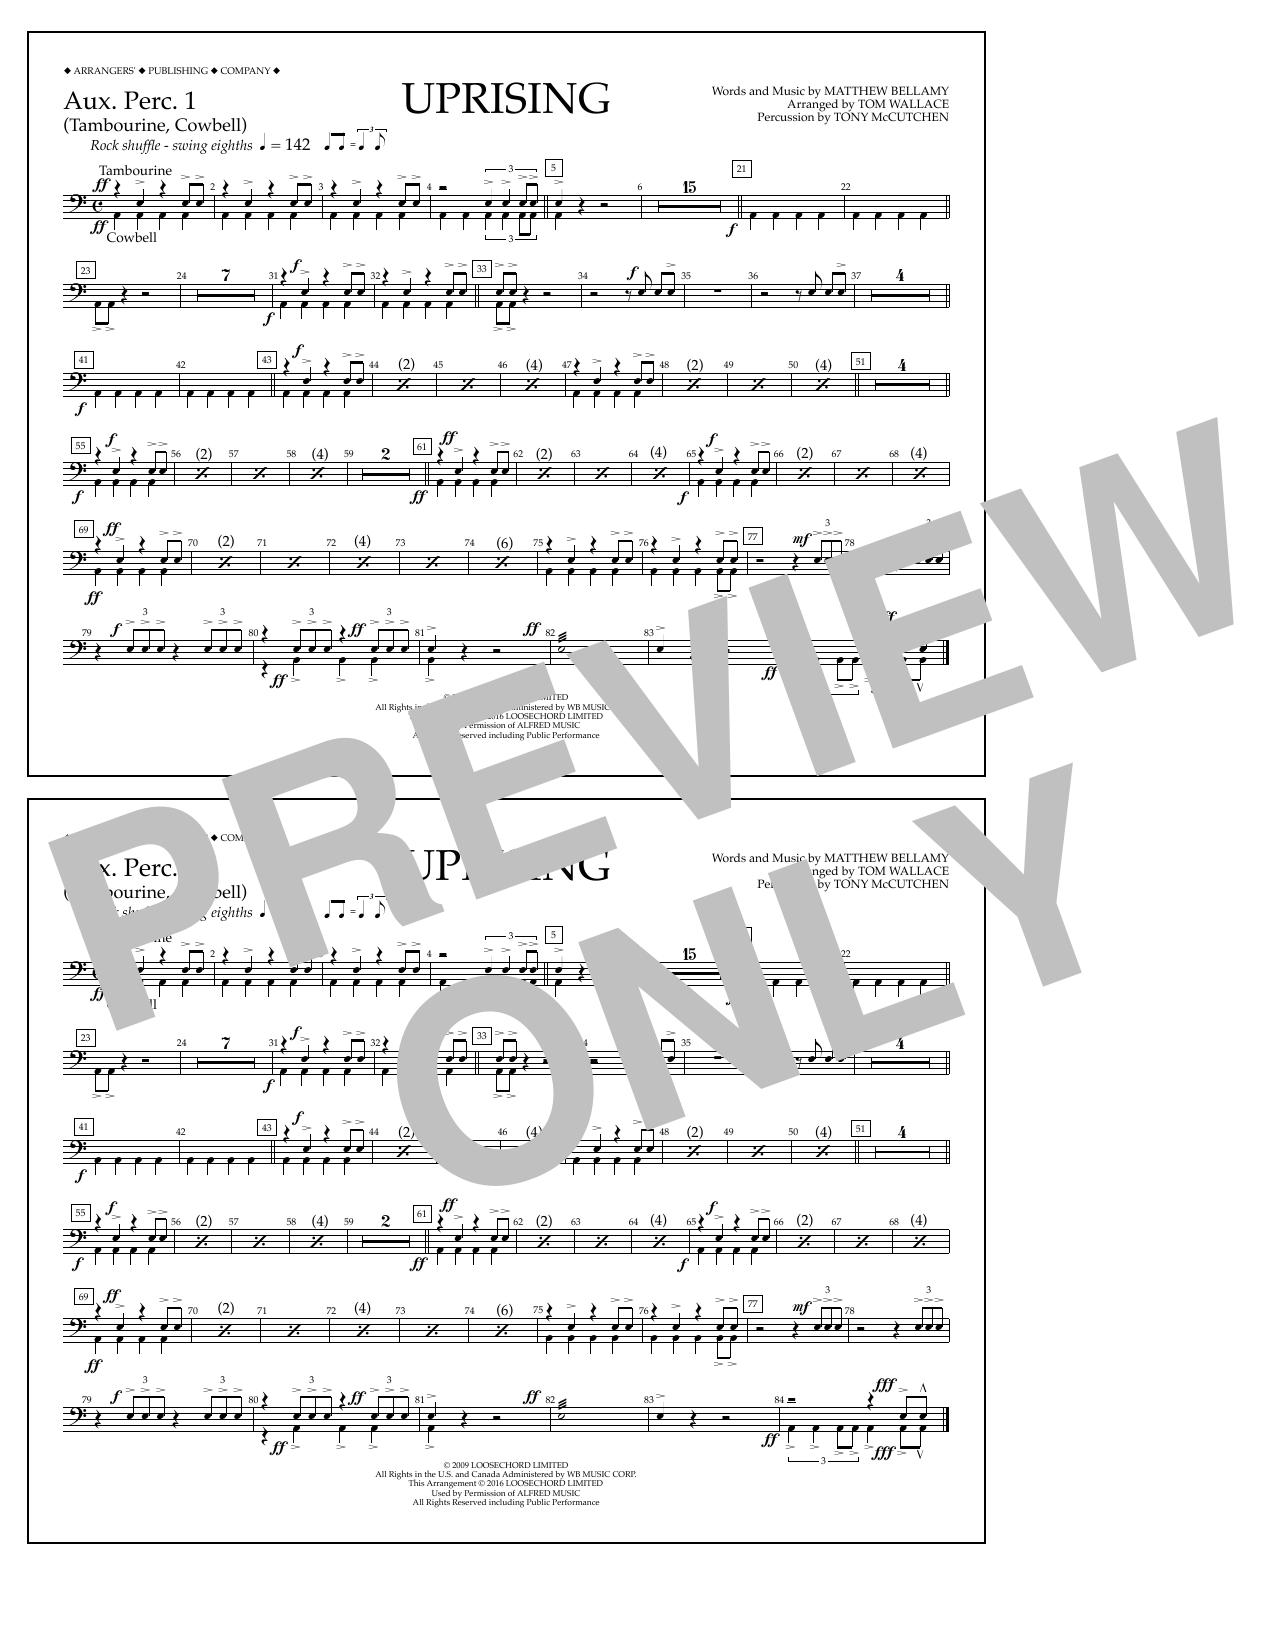 Muse - Uprising - Aux. Perc. 1